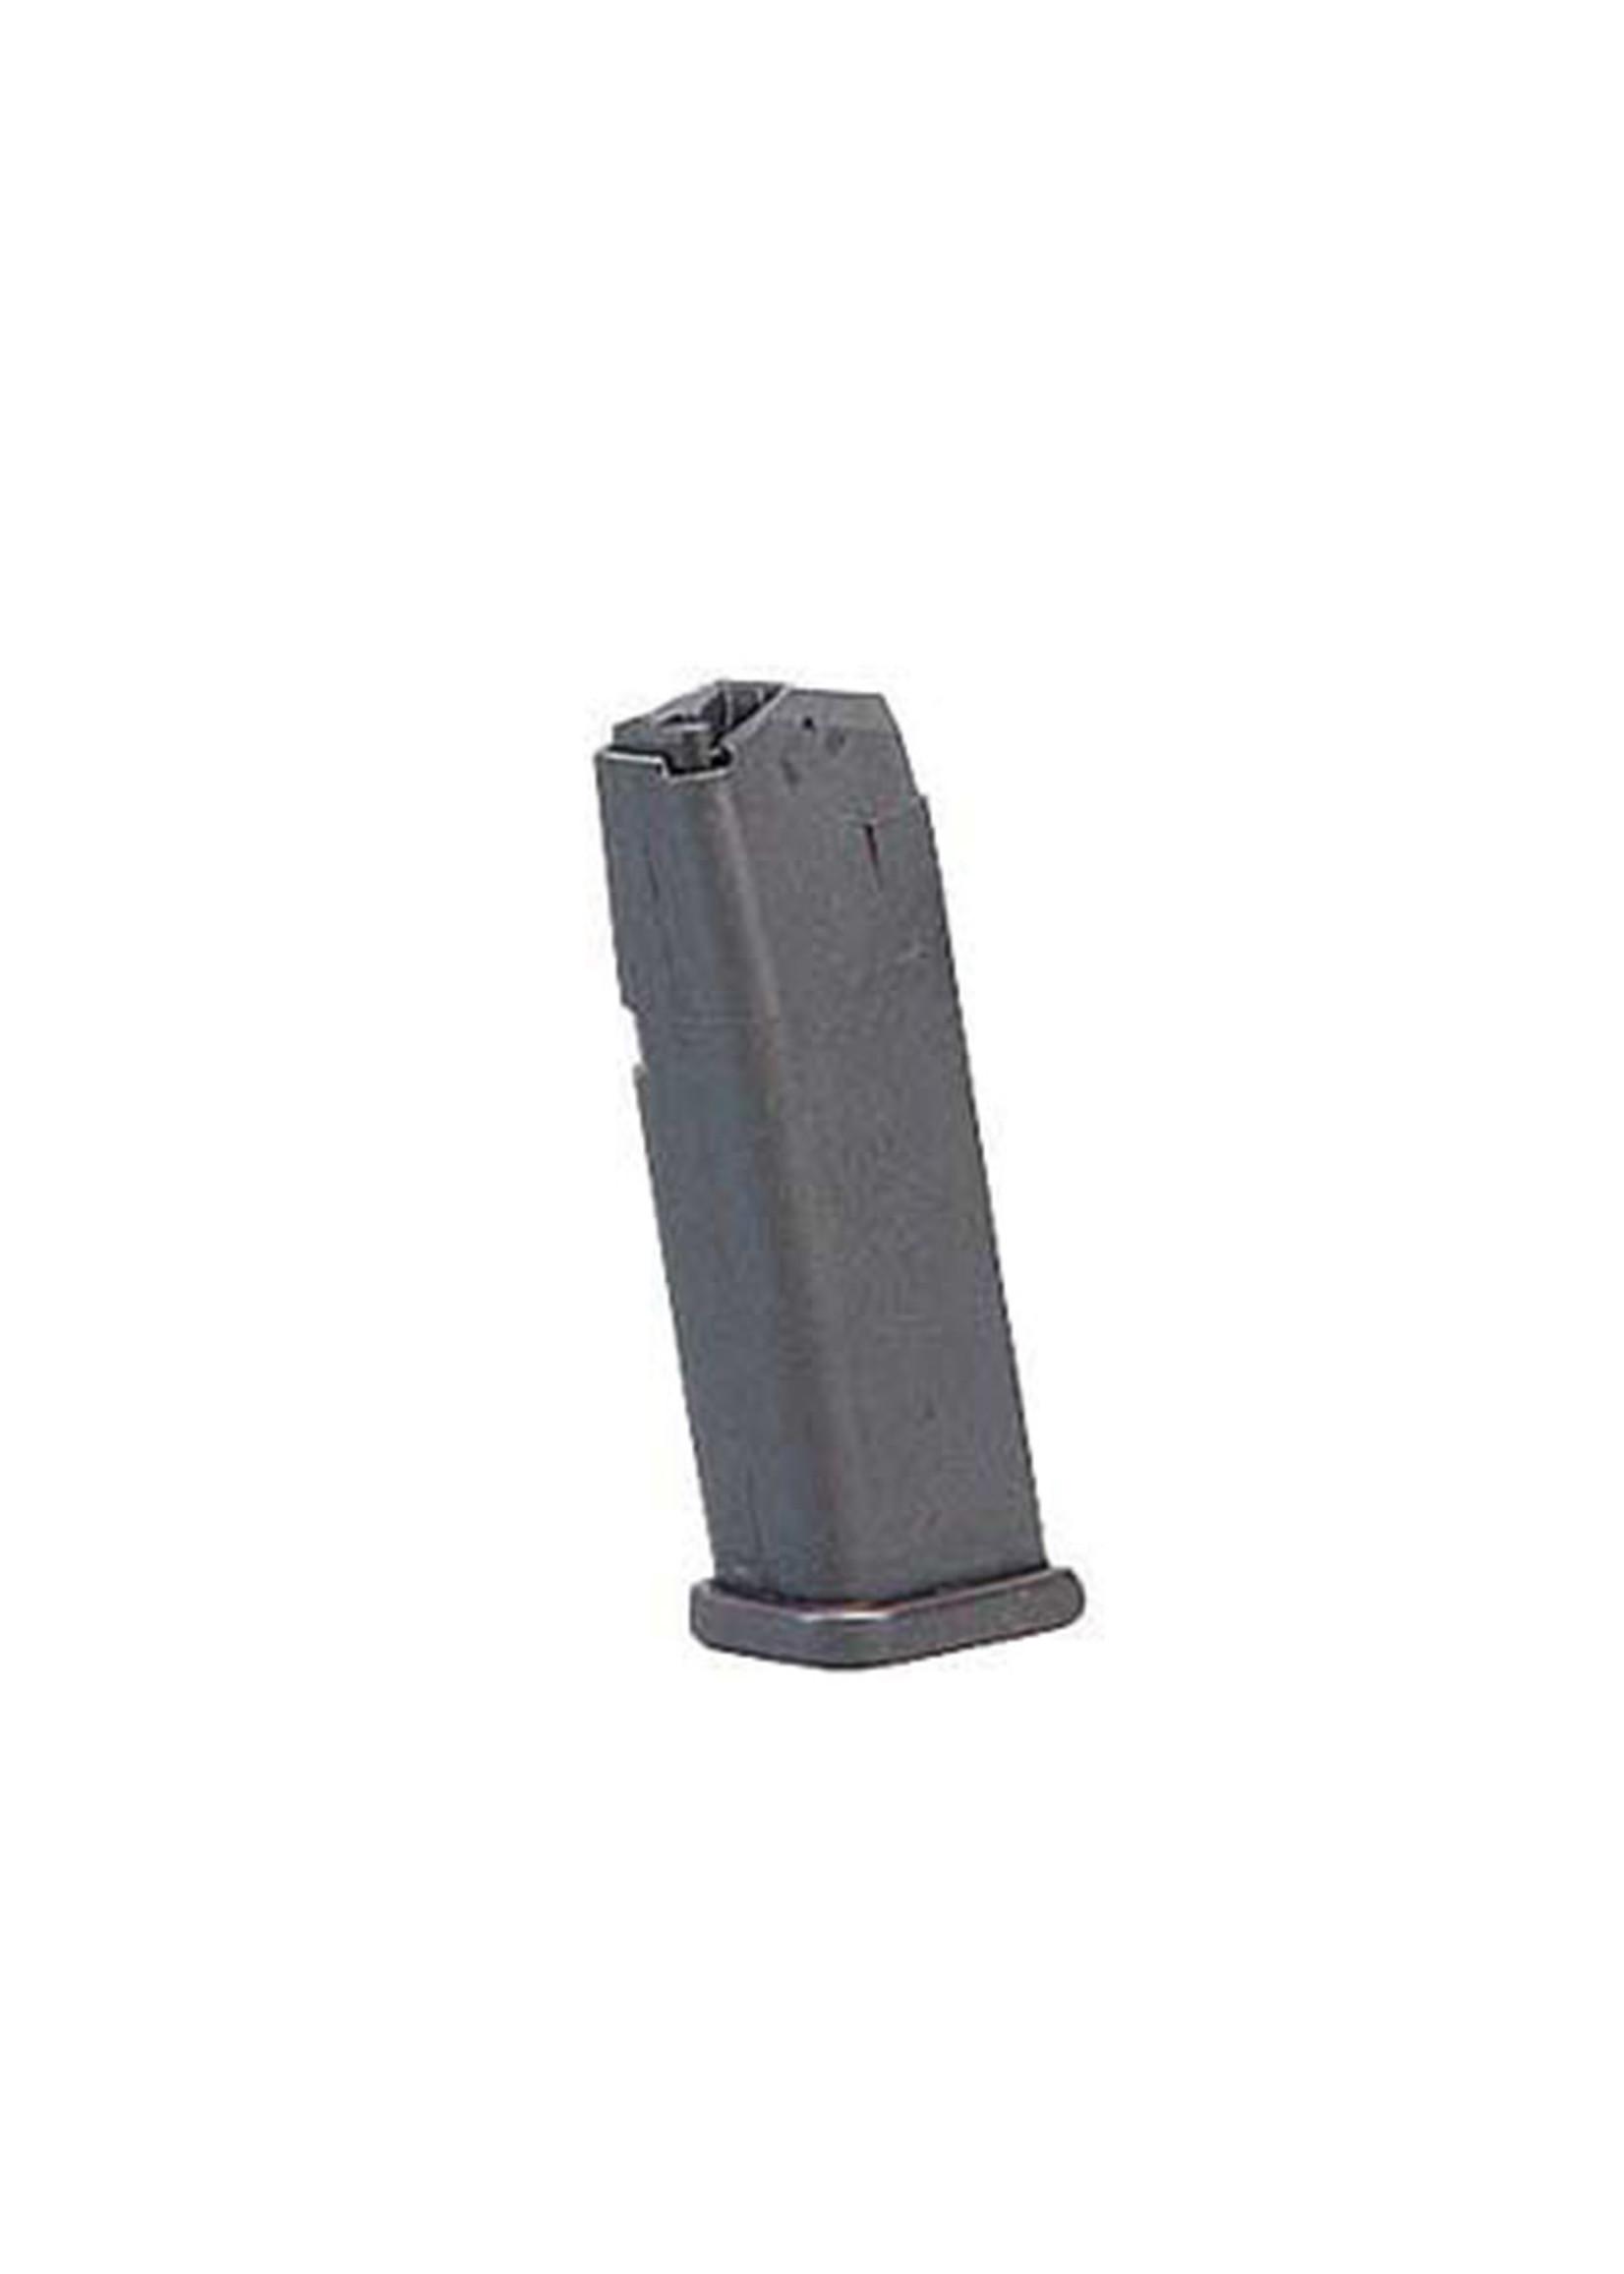 Glock Glock 23 Magazine, 40 S&W, G23, 13-round